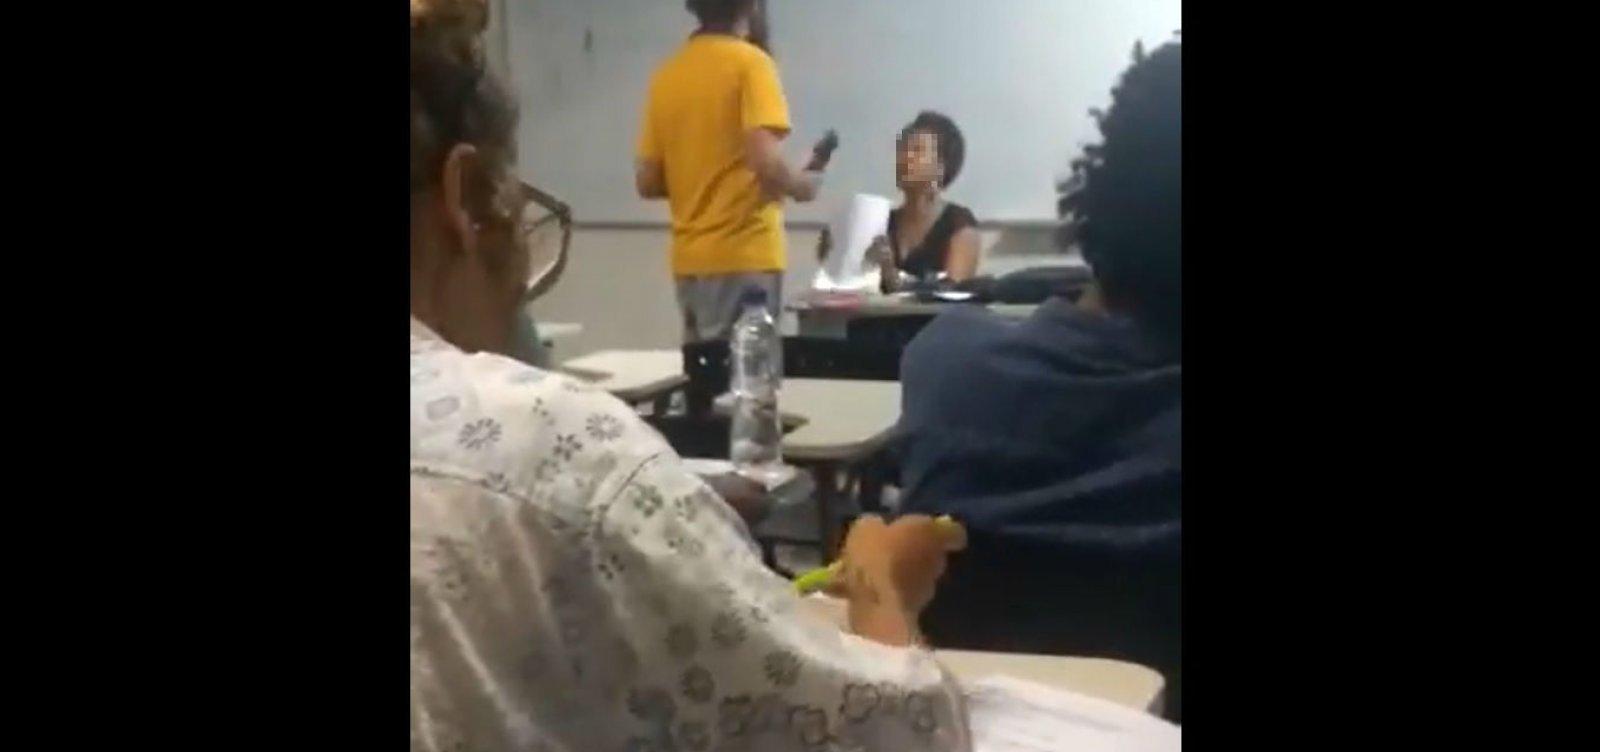 [UFRB: Aluno denunciado por racismo tentou entrar na universidade através de cotas raciais]